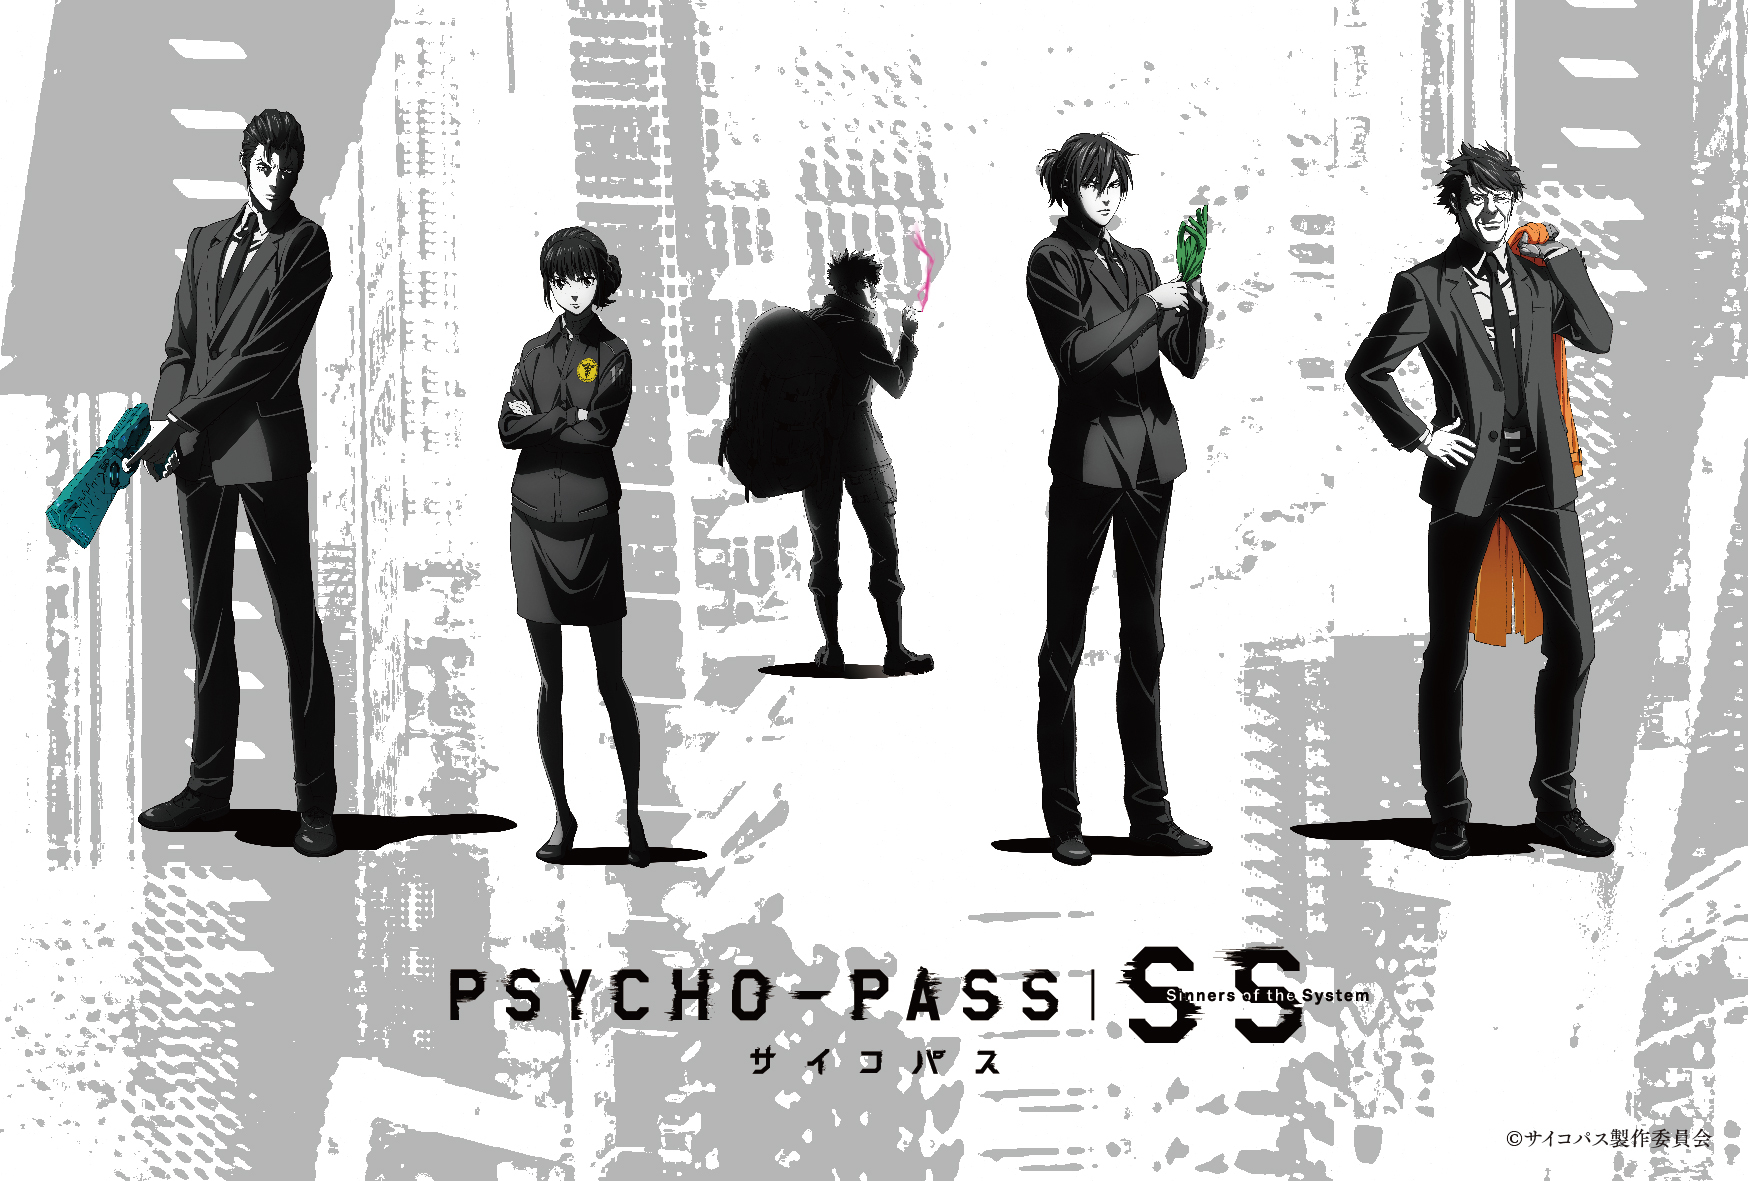 『PSYCHO-PASS サイコパス Sinners of the System』ムビチケ購入特典